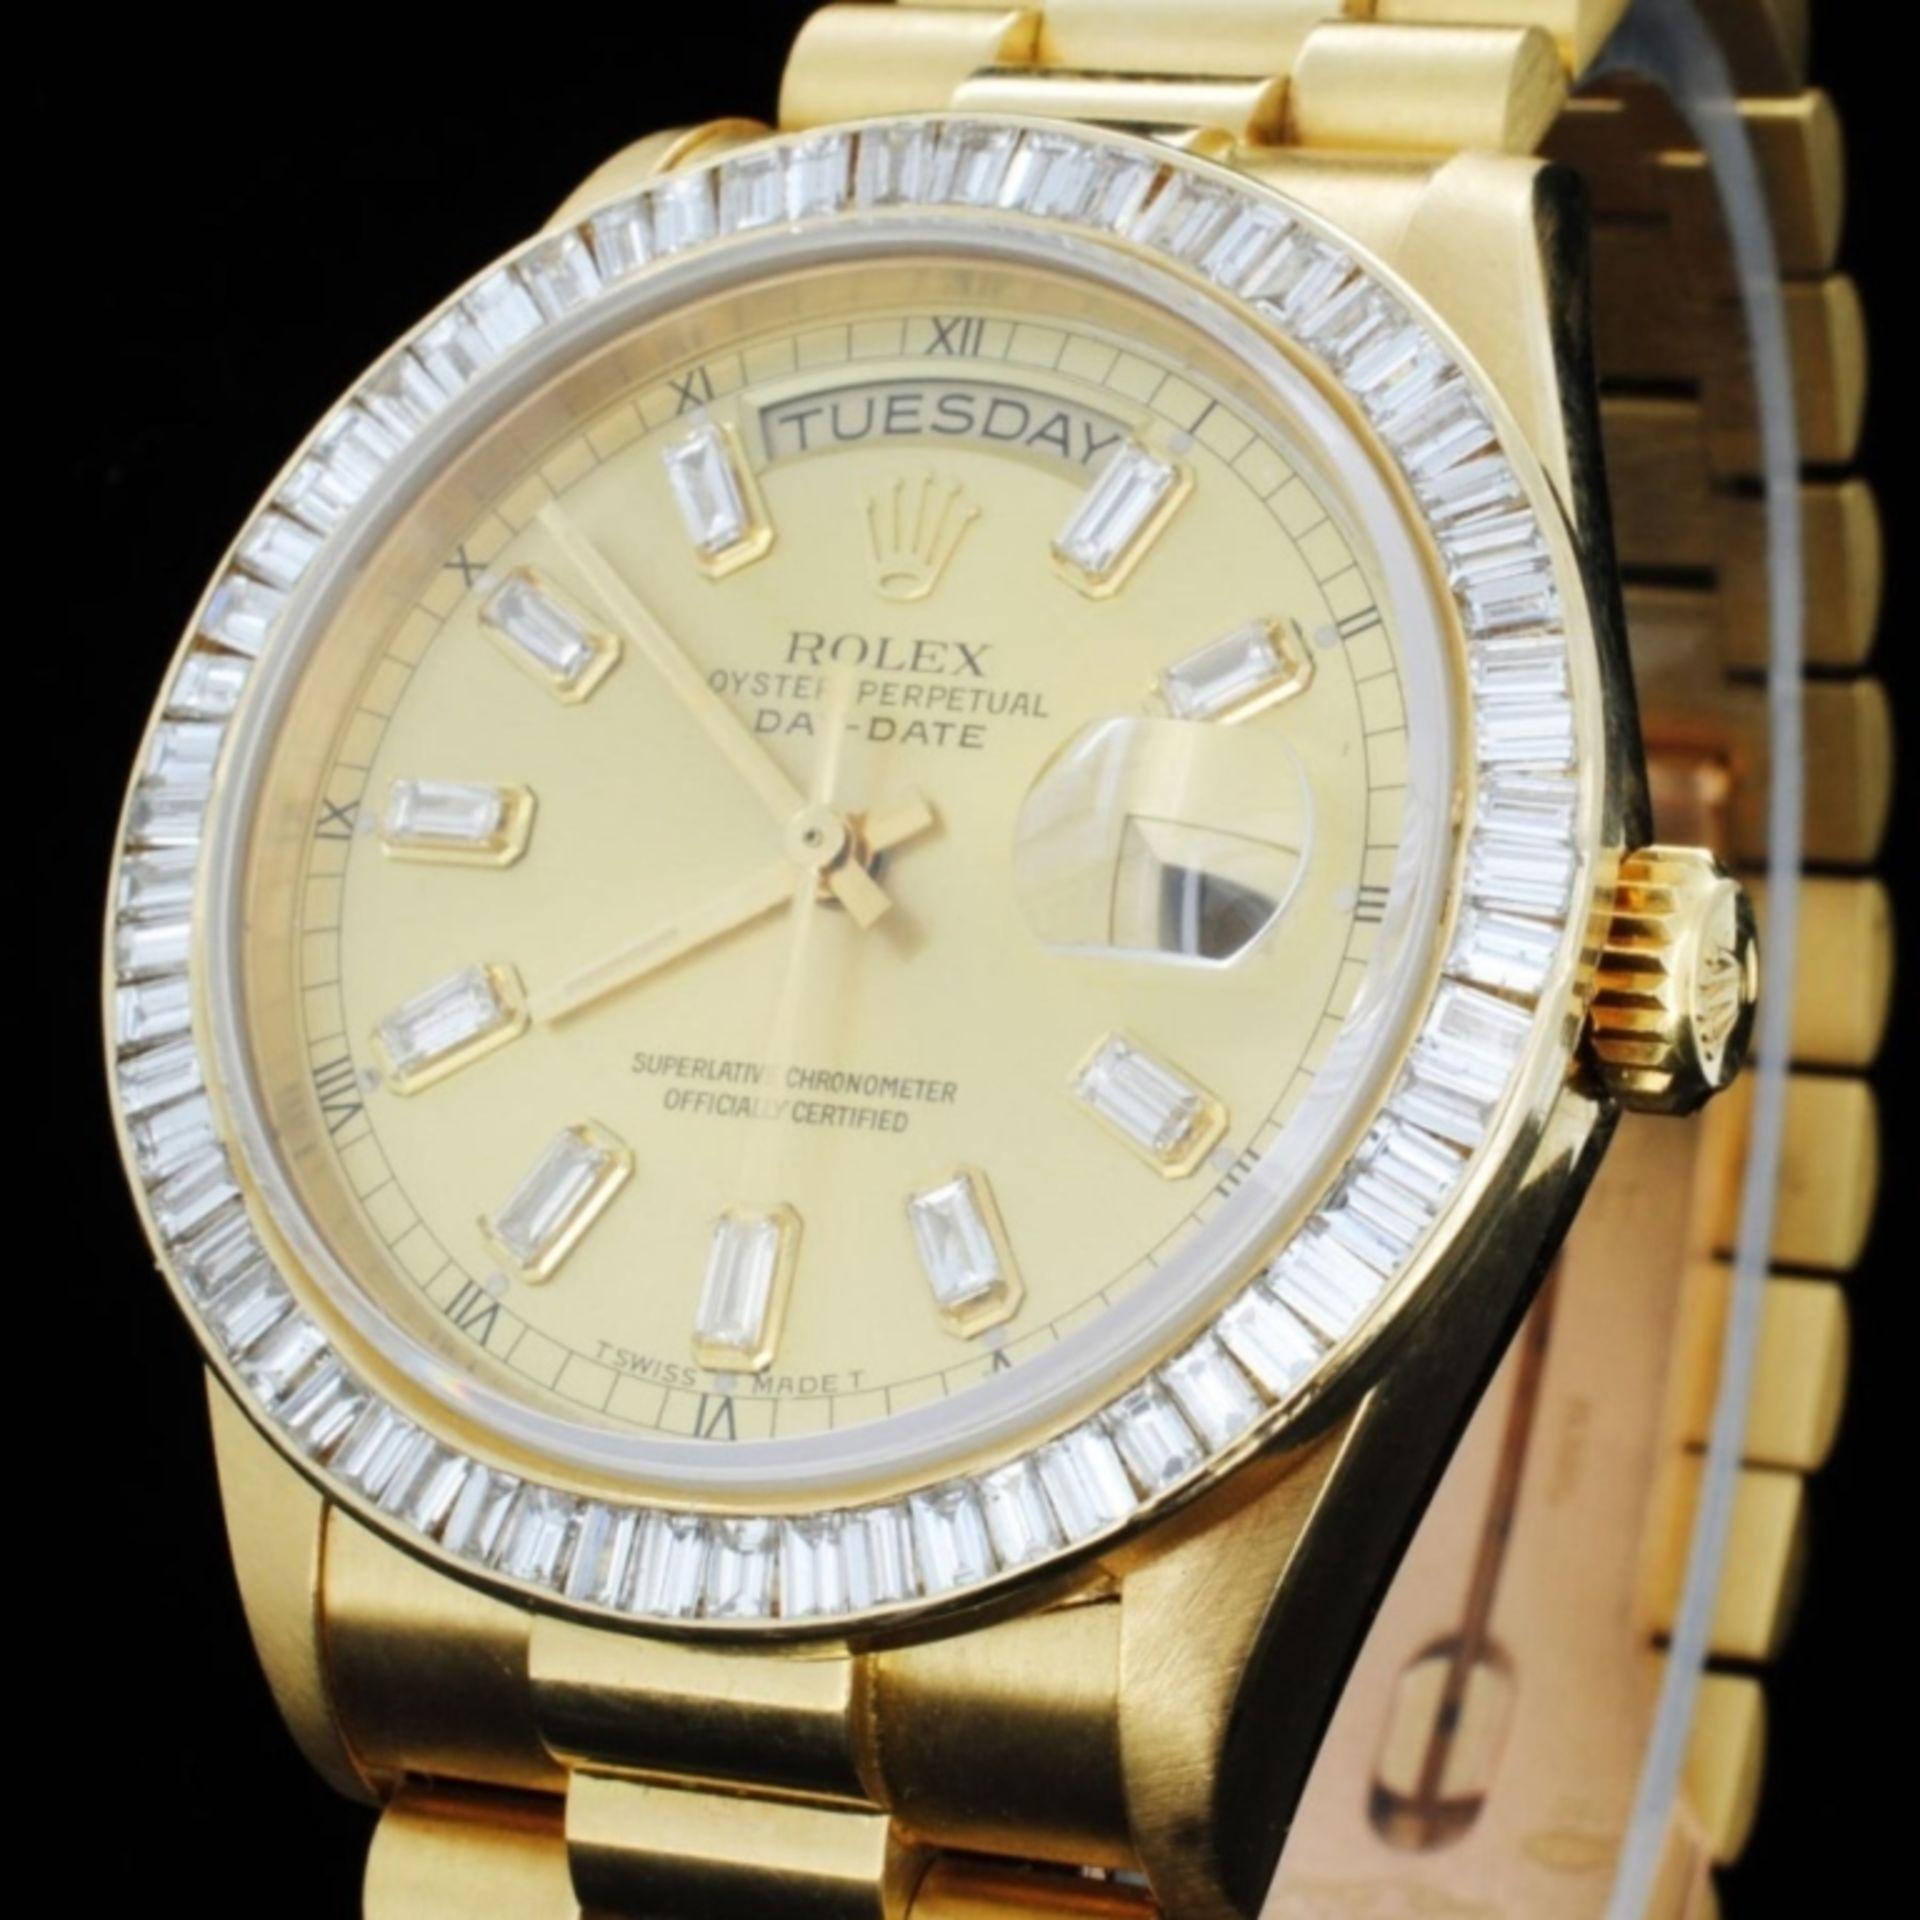 Rolex Day-Date Diamond 36mm Wristwatch - Image 2 of 6